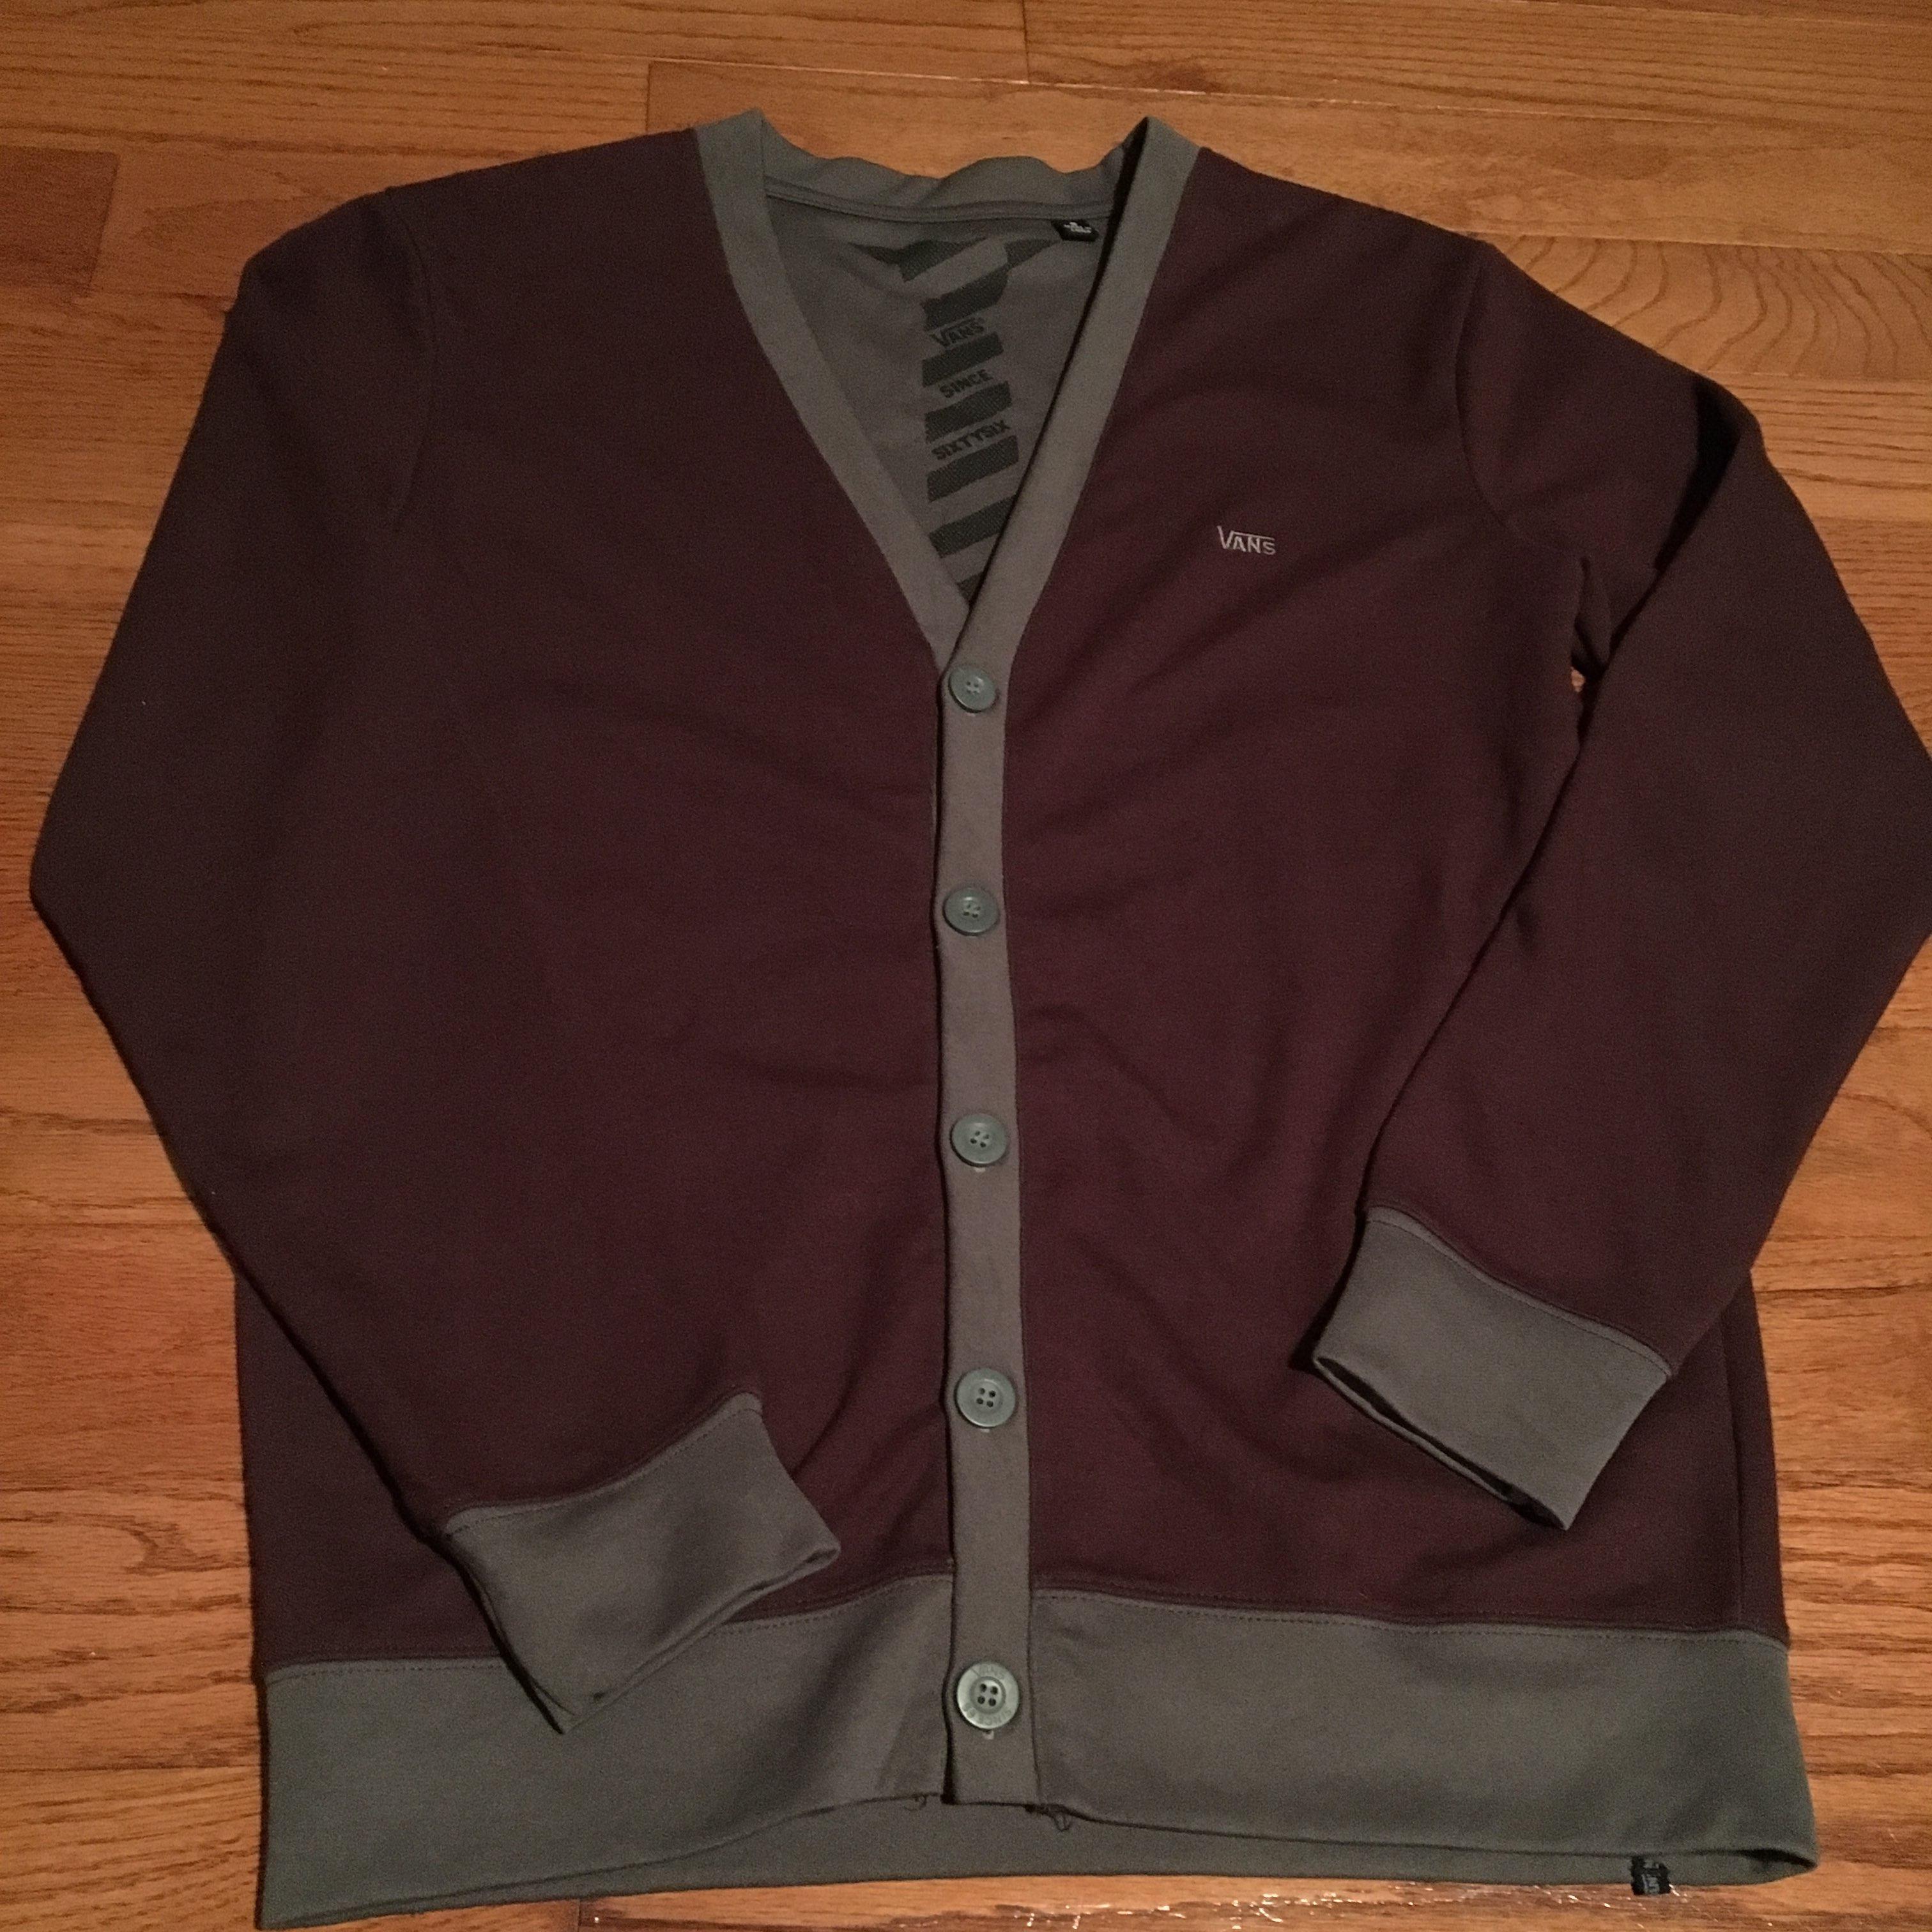 Vans Cardigan Sweater Mens Small - Mercari: BUY & SELL THINGS YOU LOVE